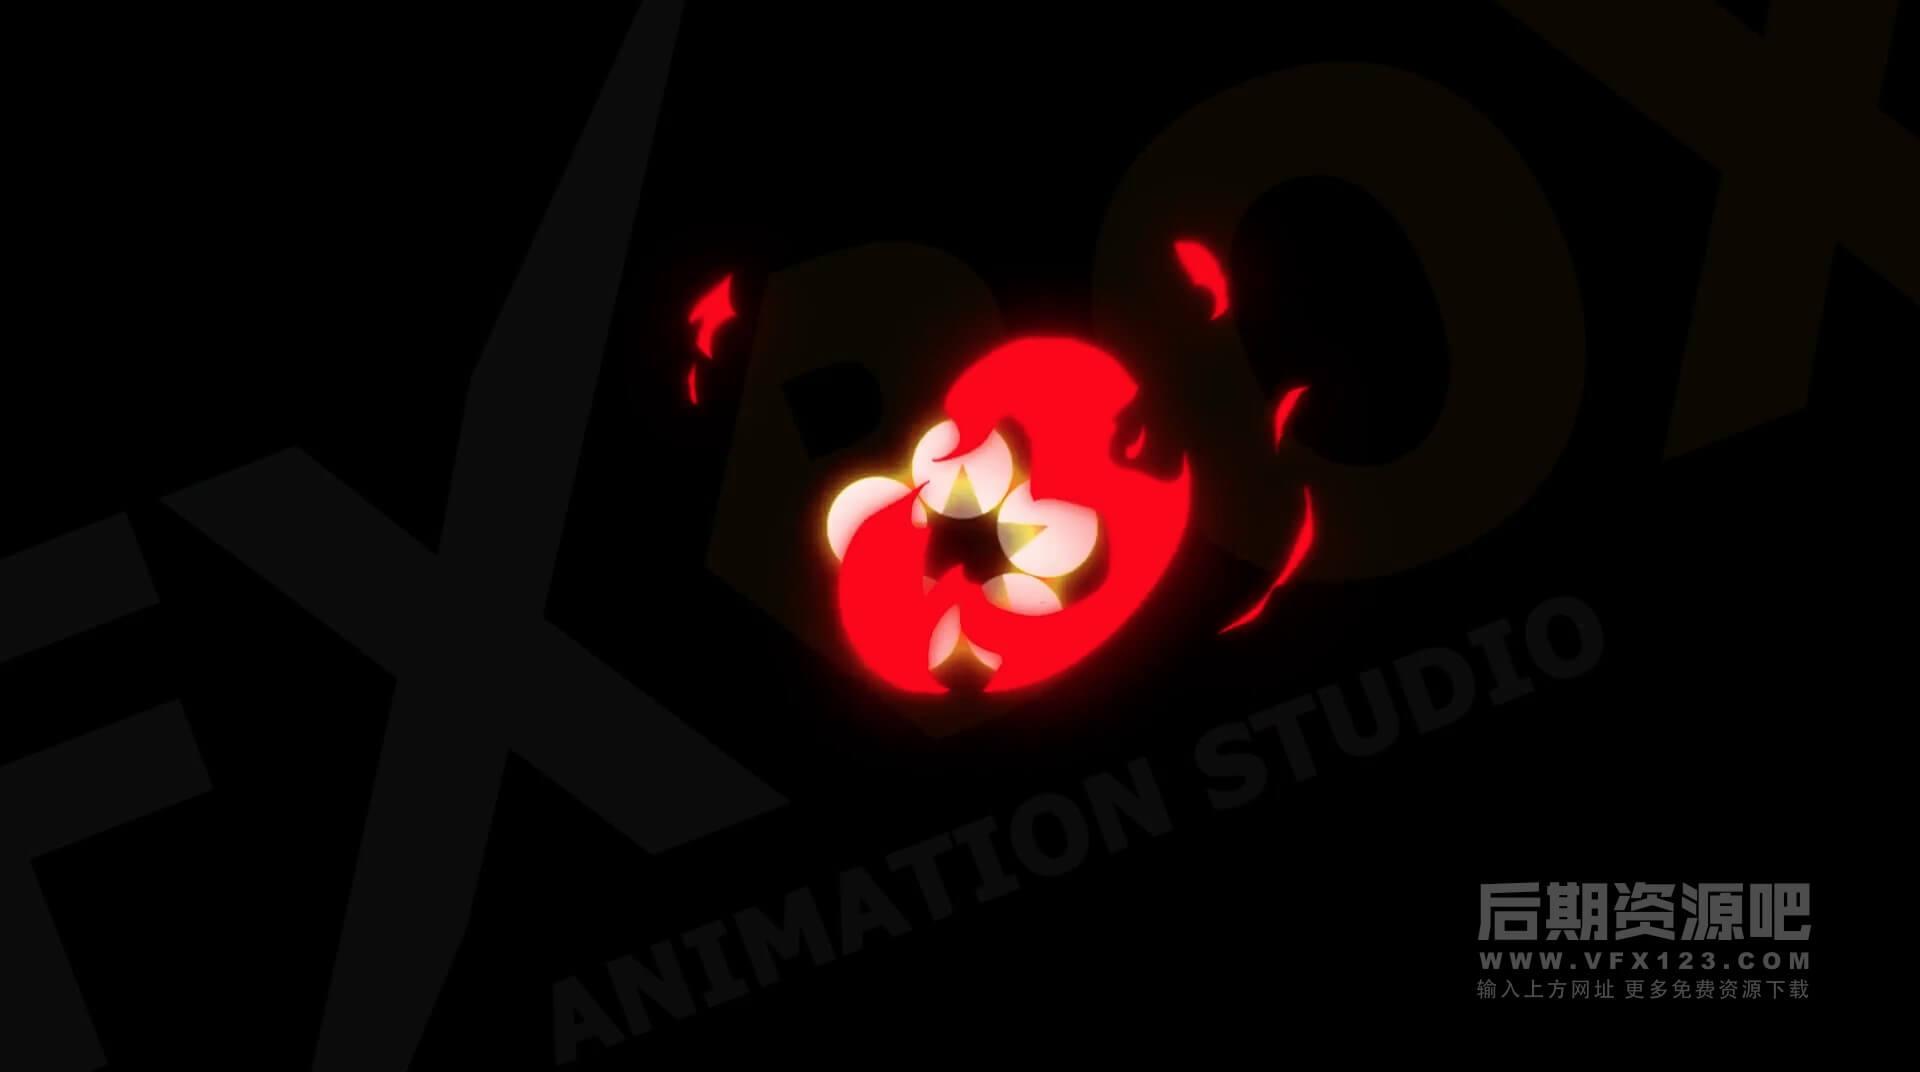 FCPX插件 10个常用火元素卡通手绘图形MG动画 Cartoon Fire Elements